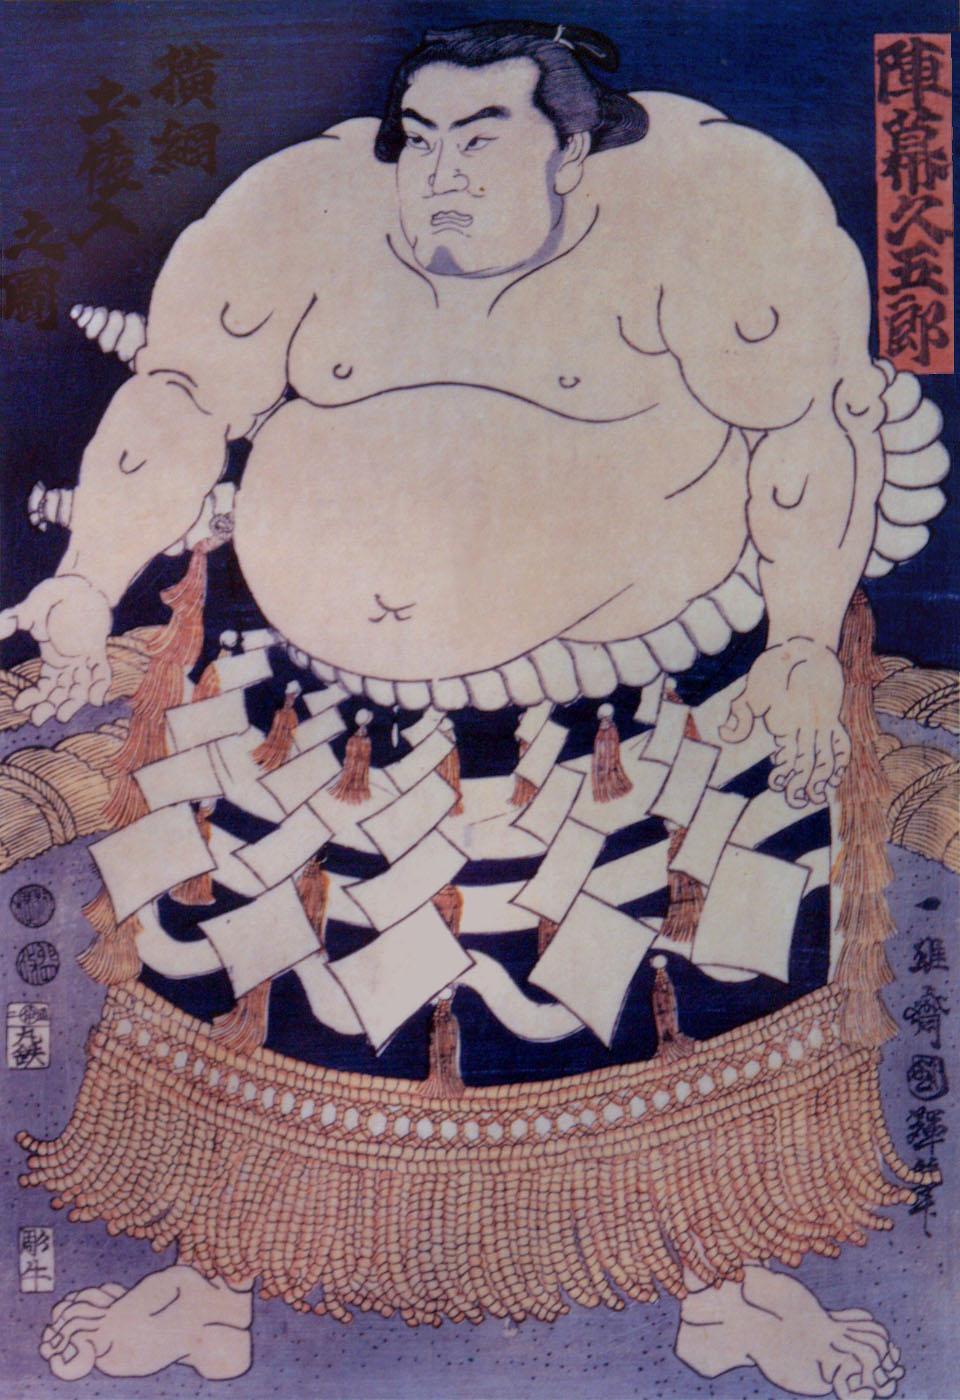 20170611-yokozuna-kobeveses-kisenosato8.jpg